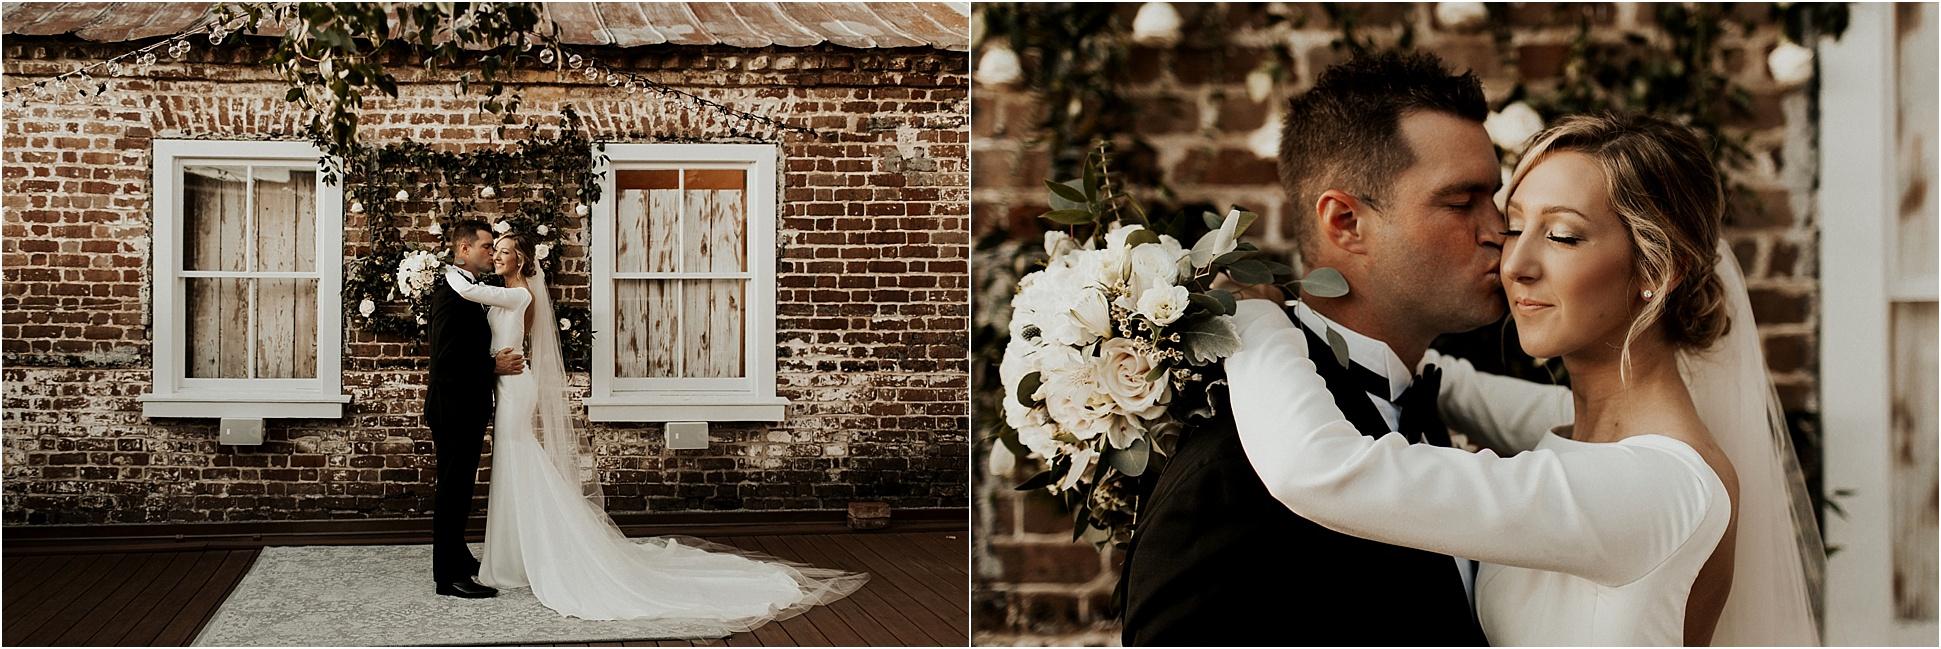 upstairs_midtown_intimate_charleston_wedding051.JPG